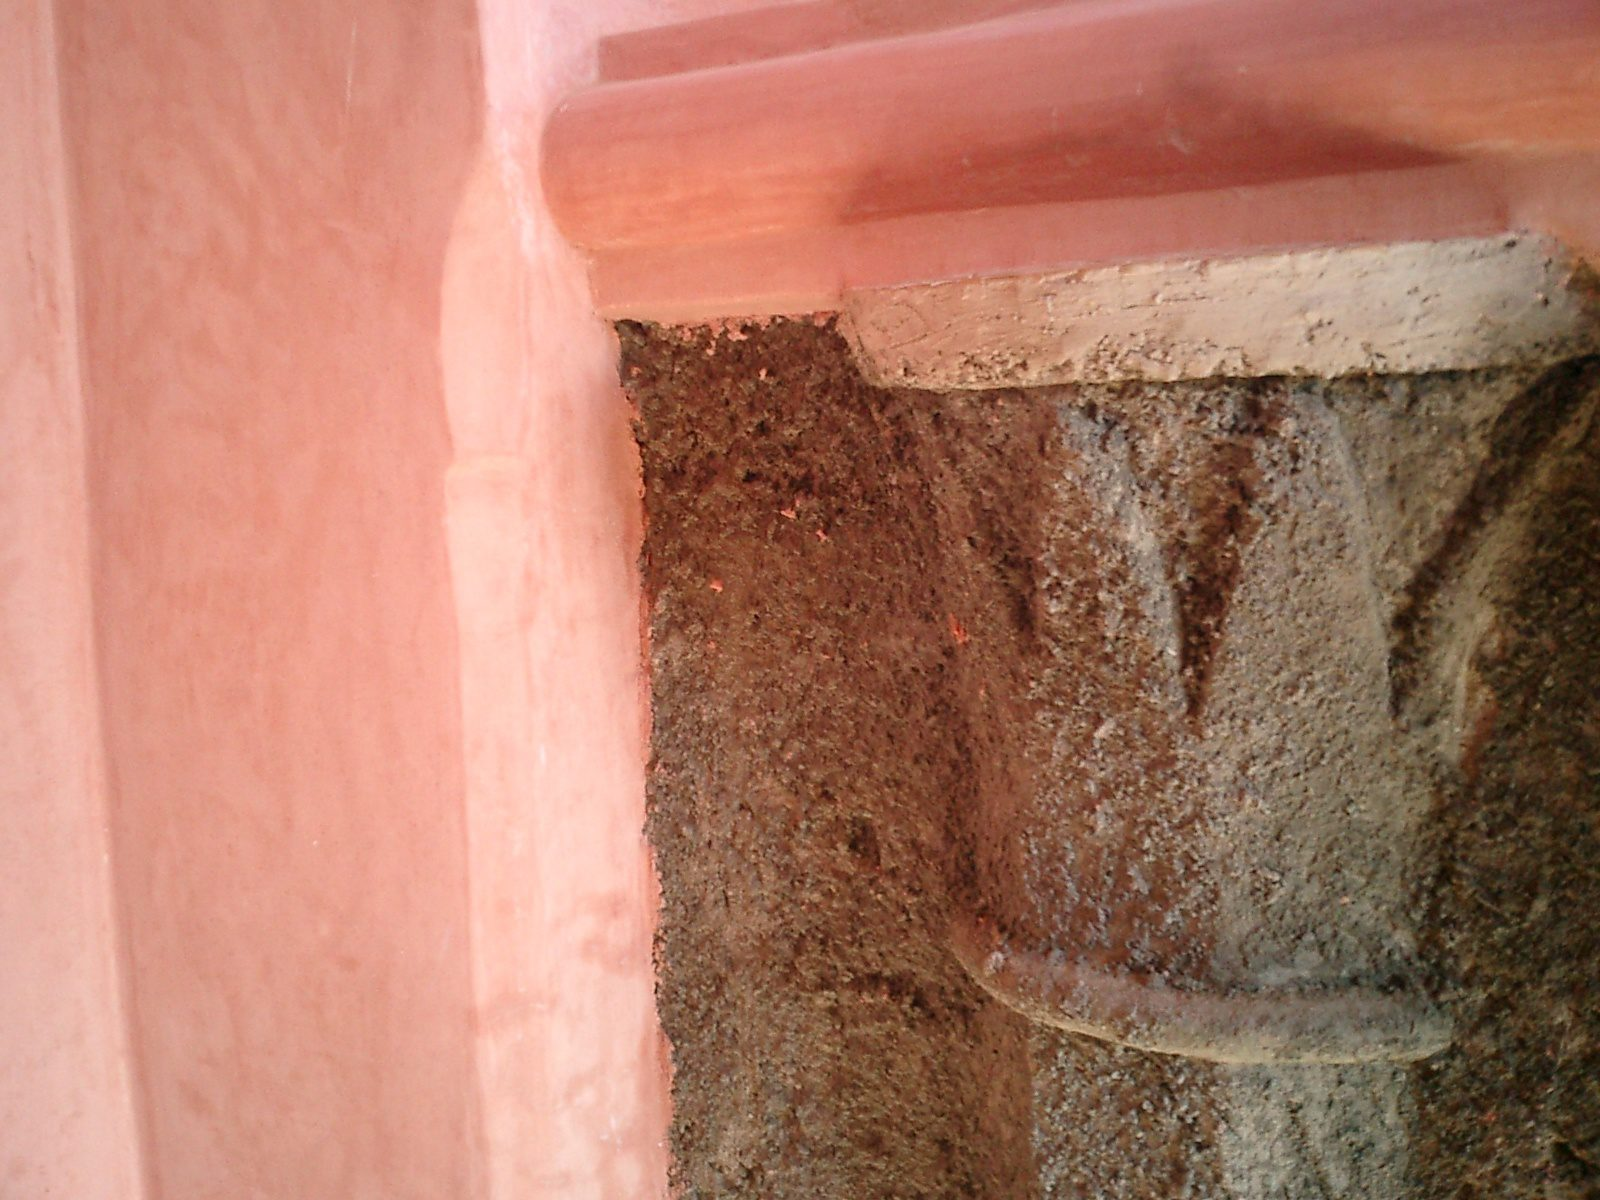 13 Tierrafino Stone Tadelakt restaurant Les Deux Tours Marrakech architect Boccara ondergrond kalkstuc lime plaster Kalkputz enduit chaux kalkpleister